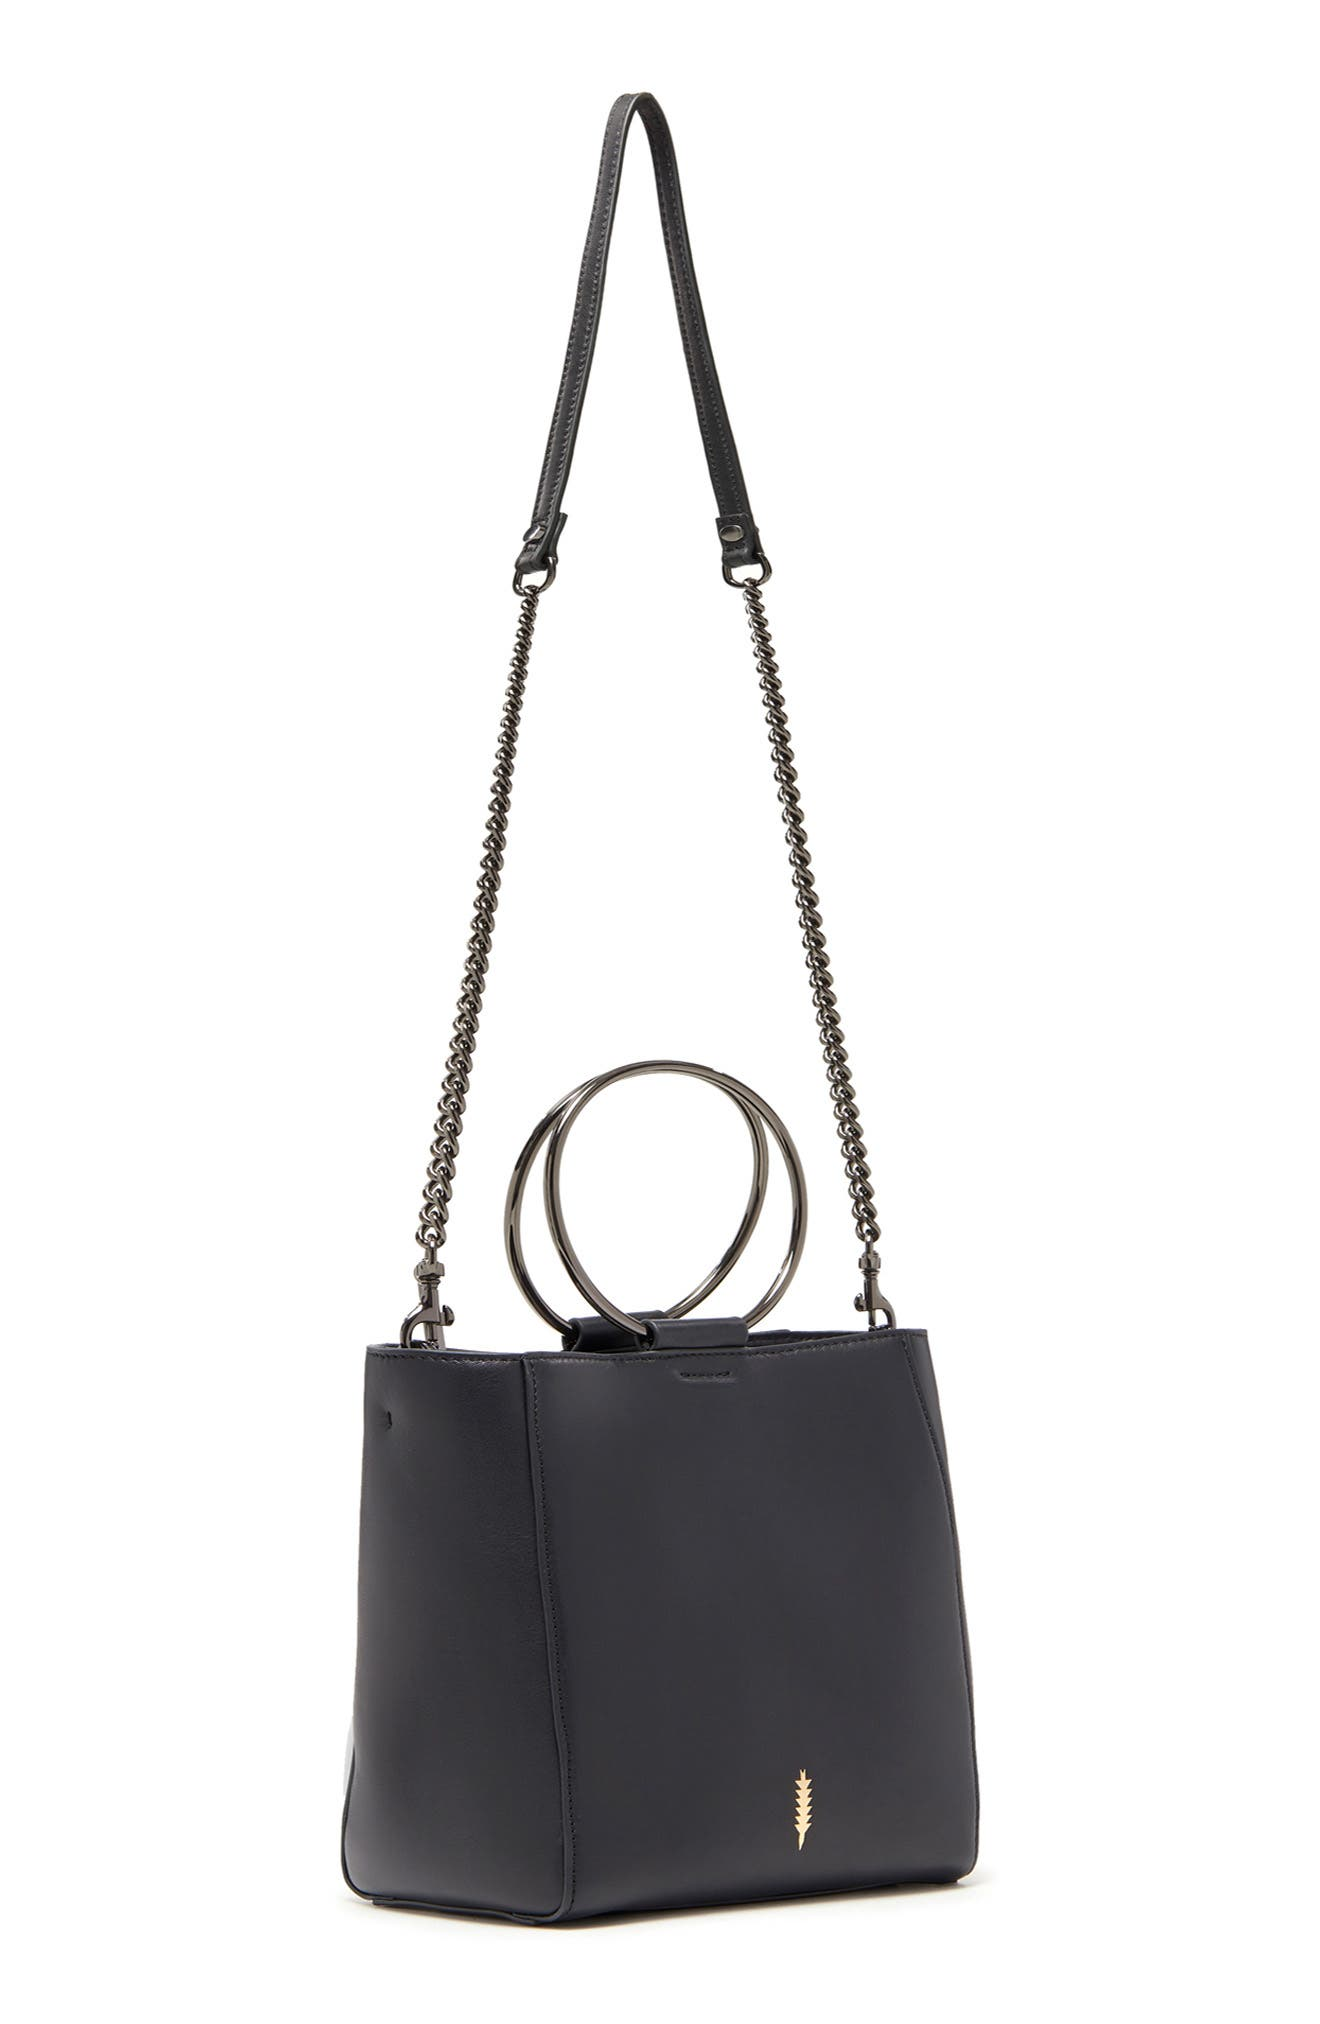 THACKER,                             Le Bucket Leather Bag,                             Alternate thumbnail 5, color,                             BLACK/ GUNMETAL